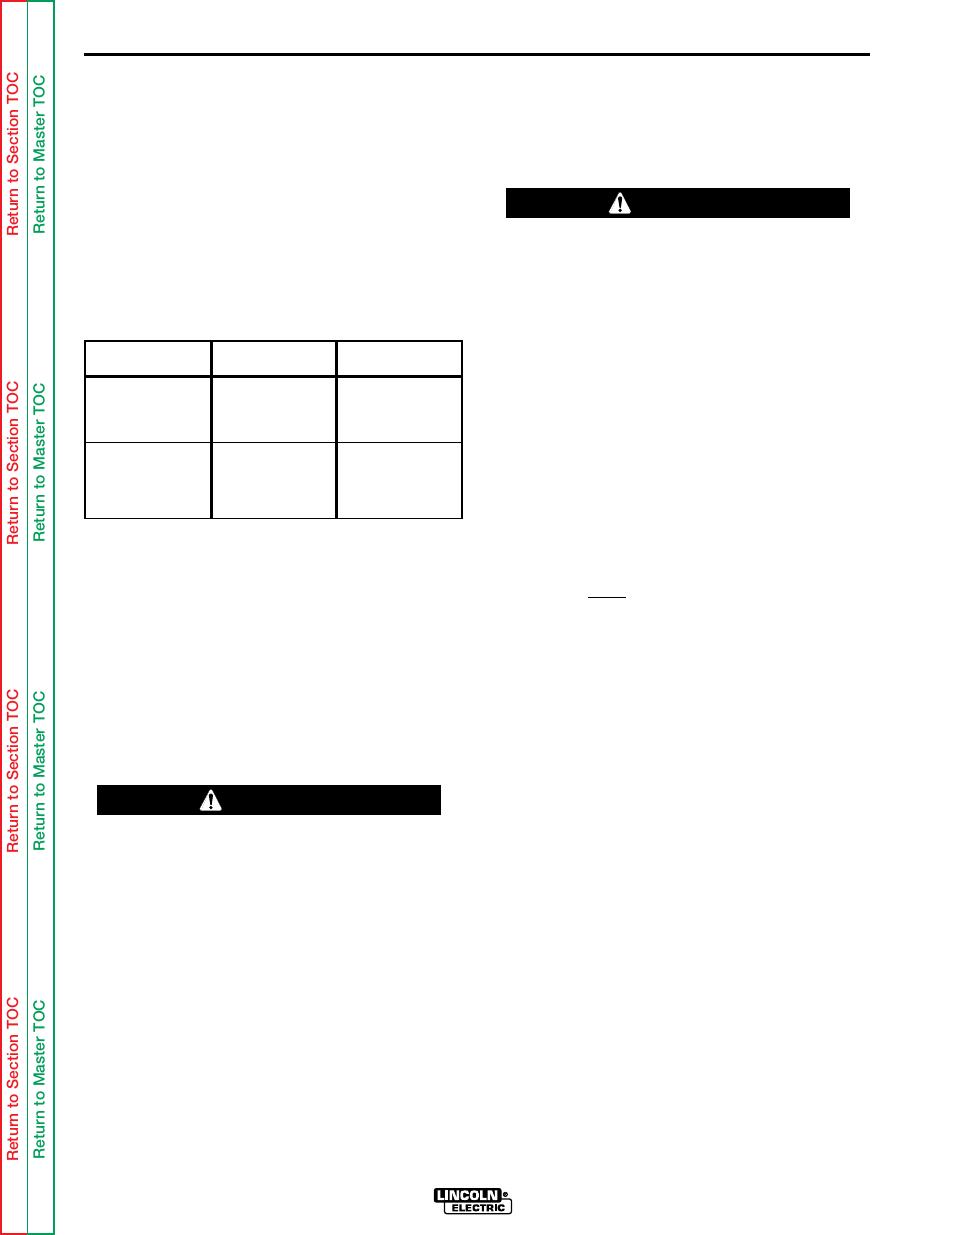 Century Wire Feed Welder 180 Mig Parts Diagram 130 Model